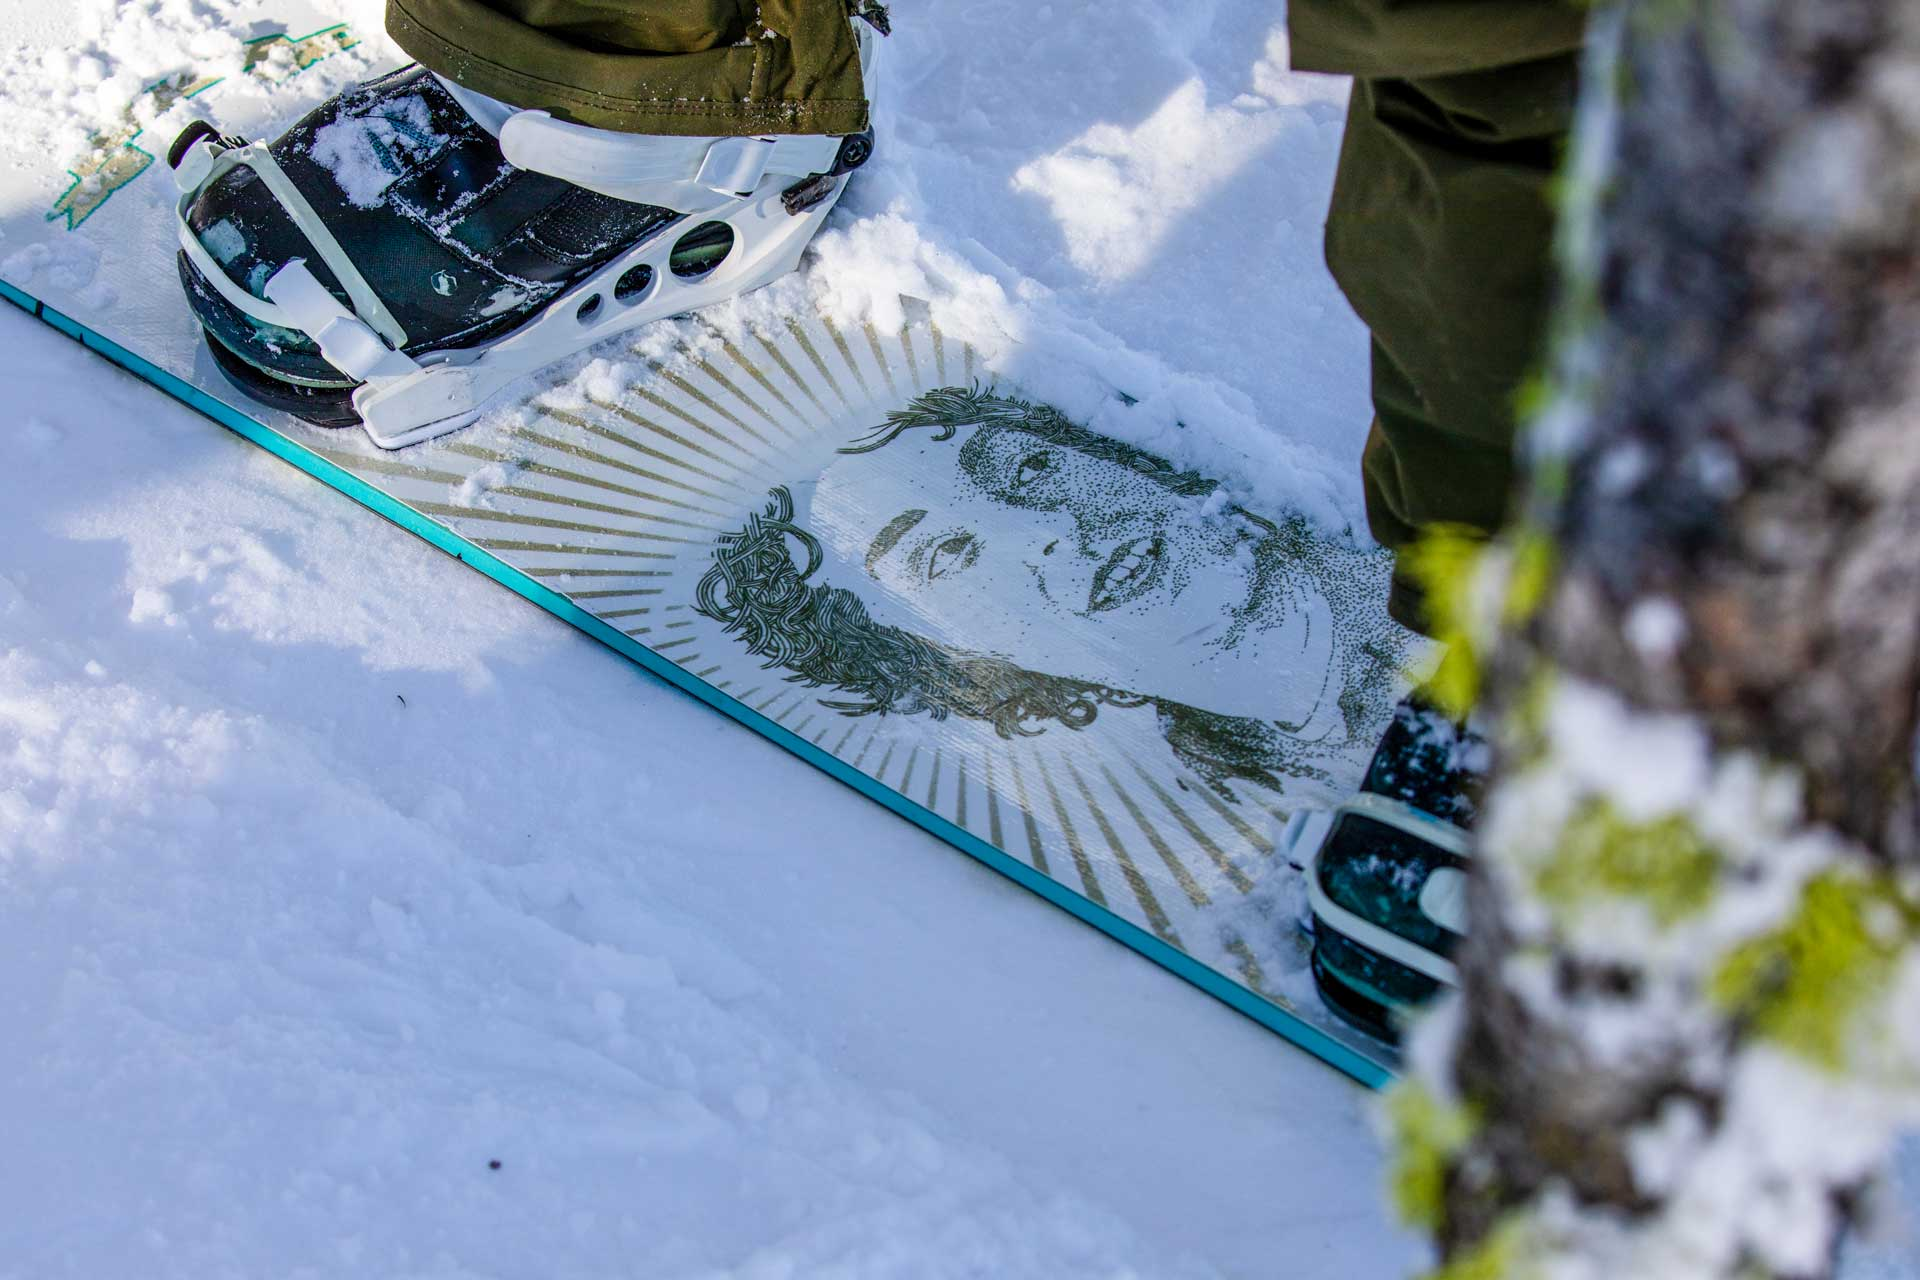 19-20 JHSM. Snowboarding. Smash Life. Rider: Kyle Miller. Photo: Ben Gavelda.